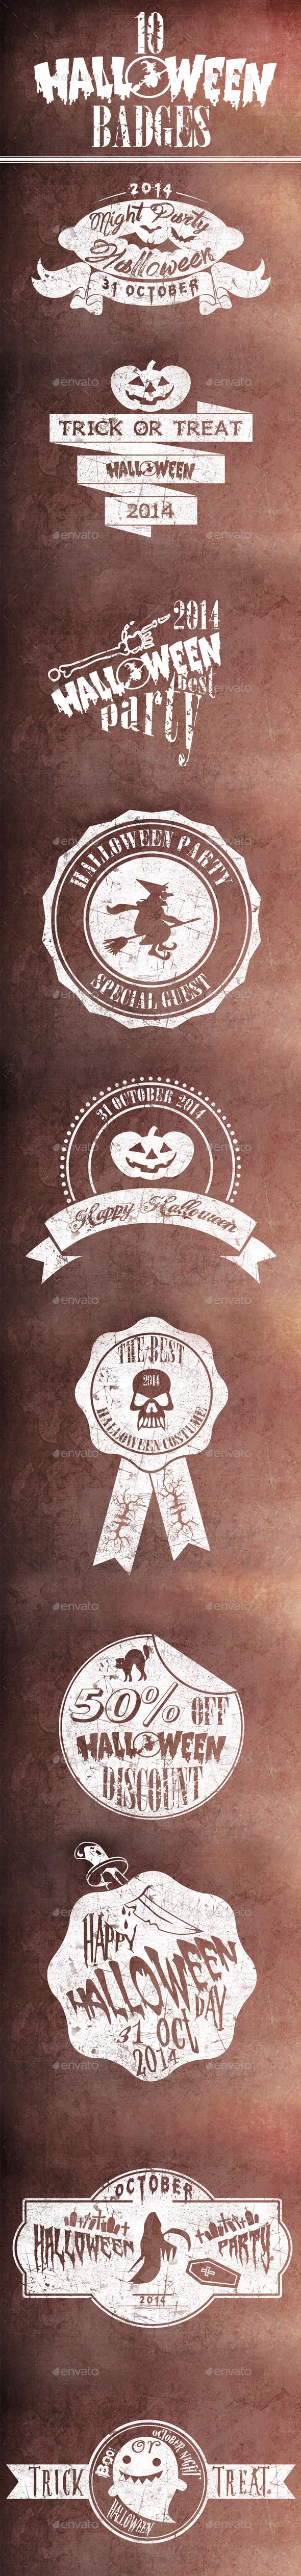 GraphicRiver 10 Halloween Badges 9133956